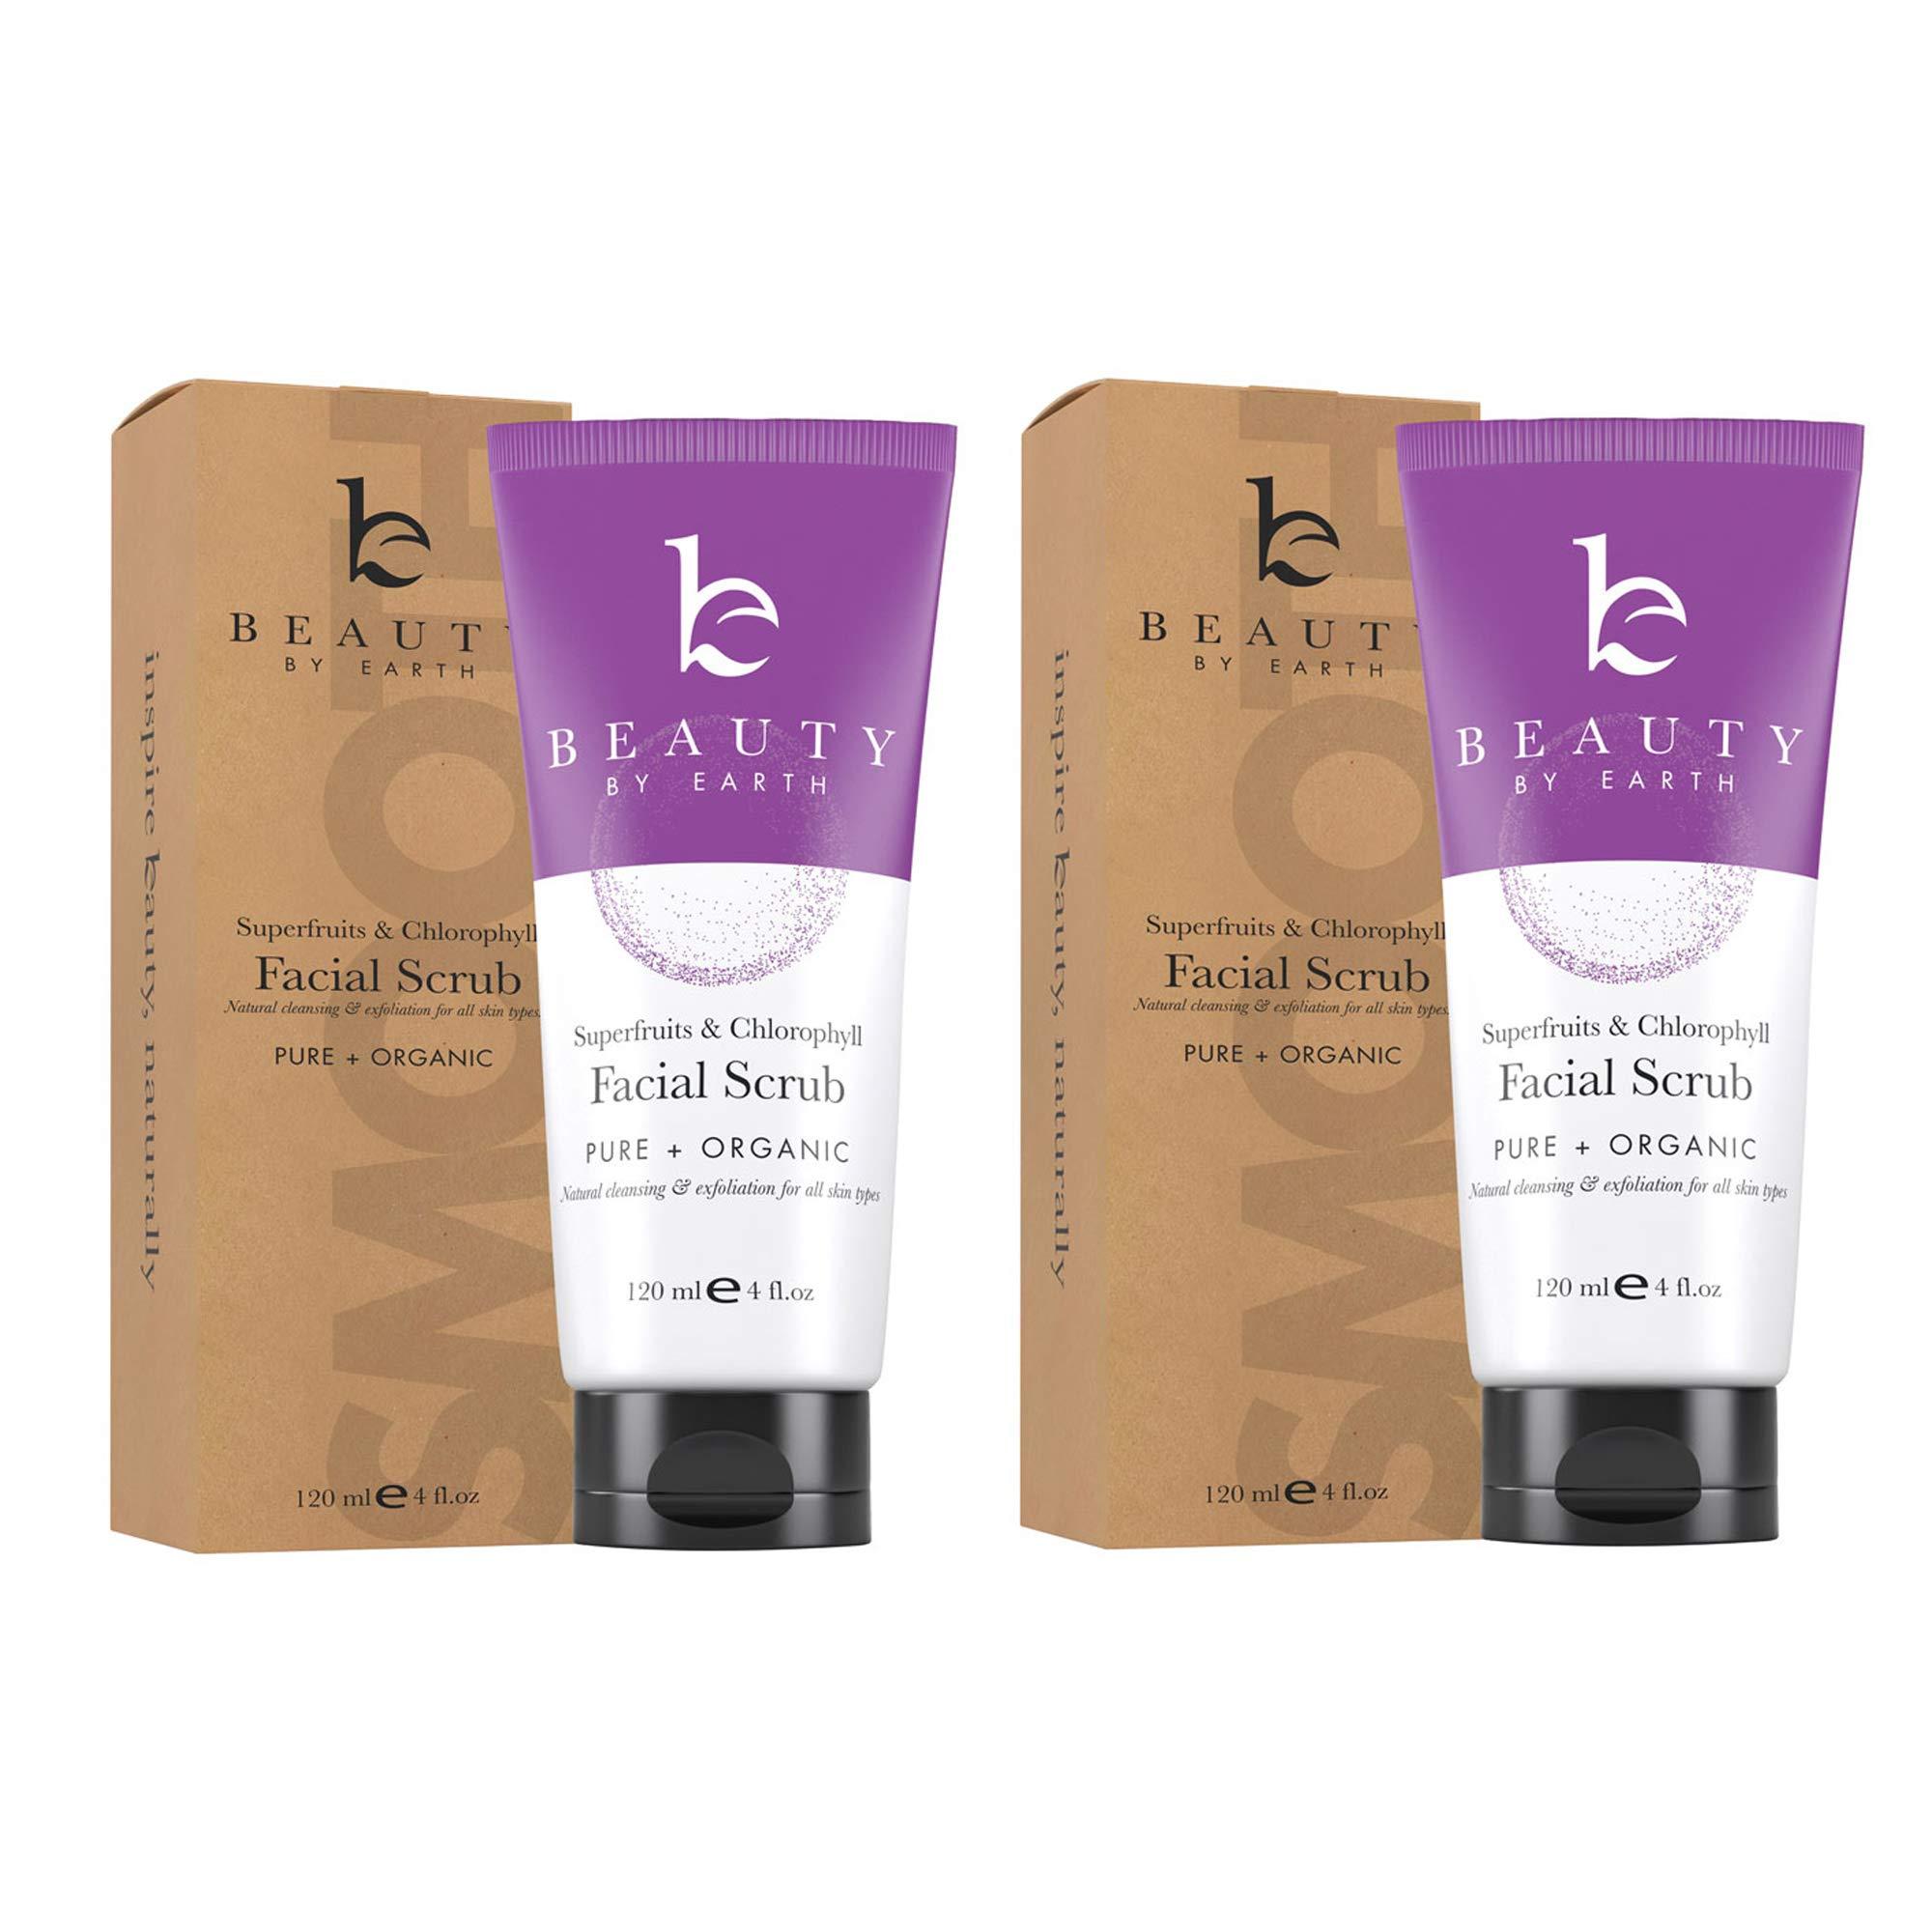 Face Scrub Exfoliating Face Wash - Natural & Organic Face Cleanser and Face Exfoliator for Women & Men, Facial Scrub Microdermabrasion, Exfoliating Face Scrub Vegan Facial Wash Skin Care Products 2pk